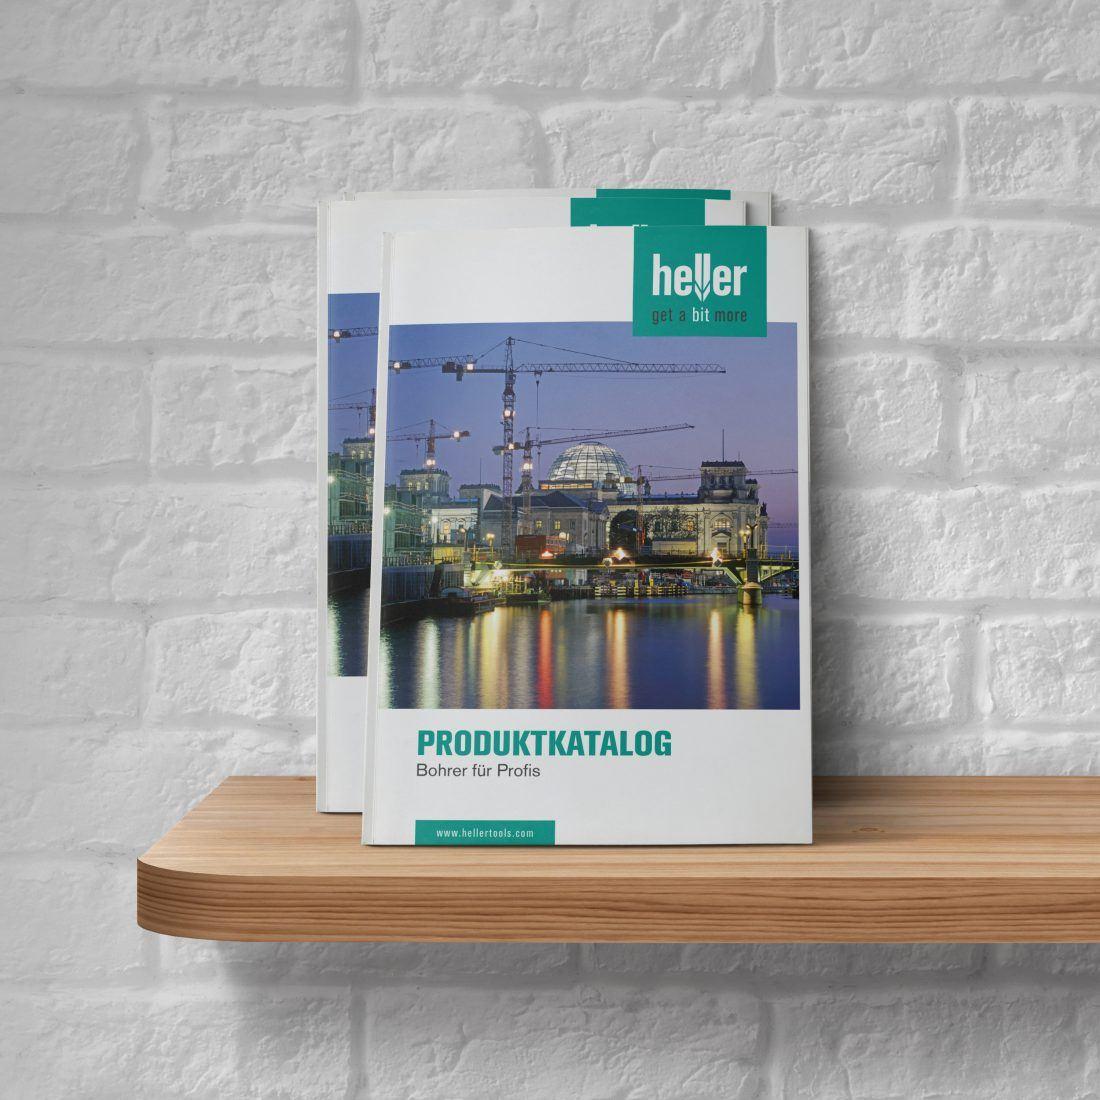 Heller_Katalog_v1